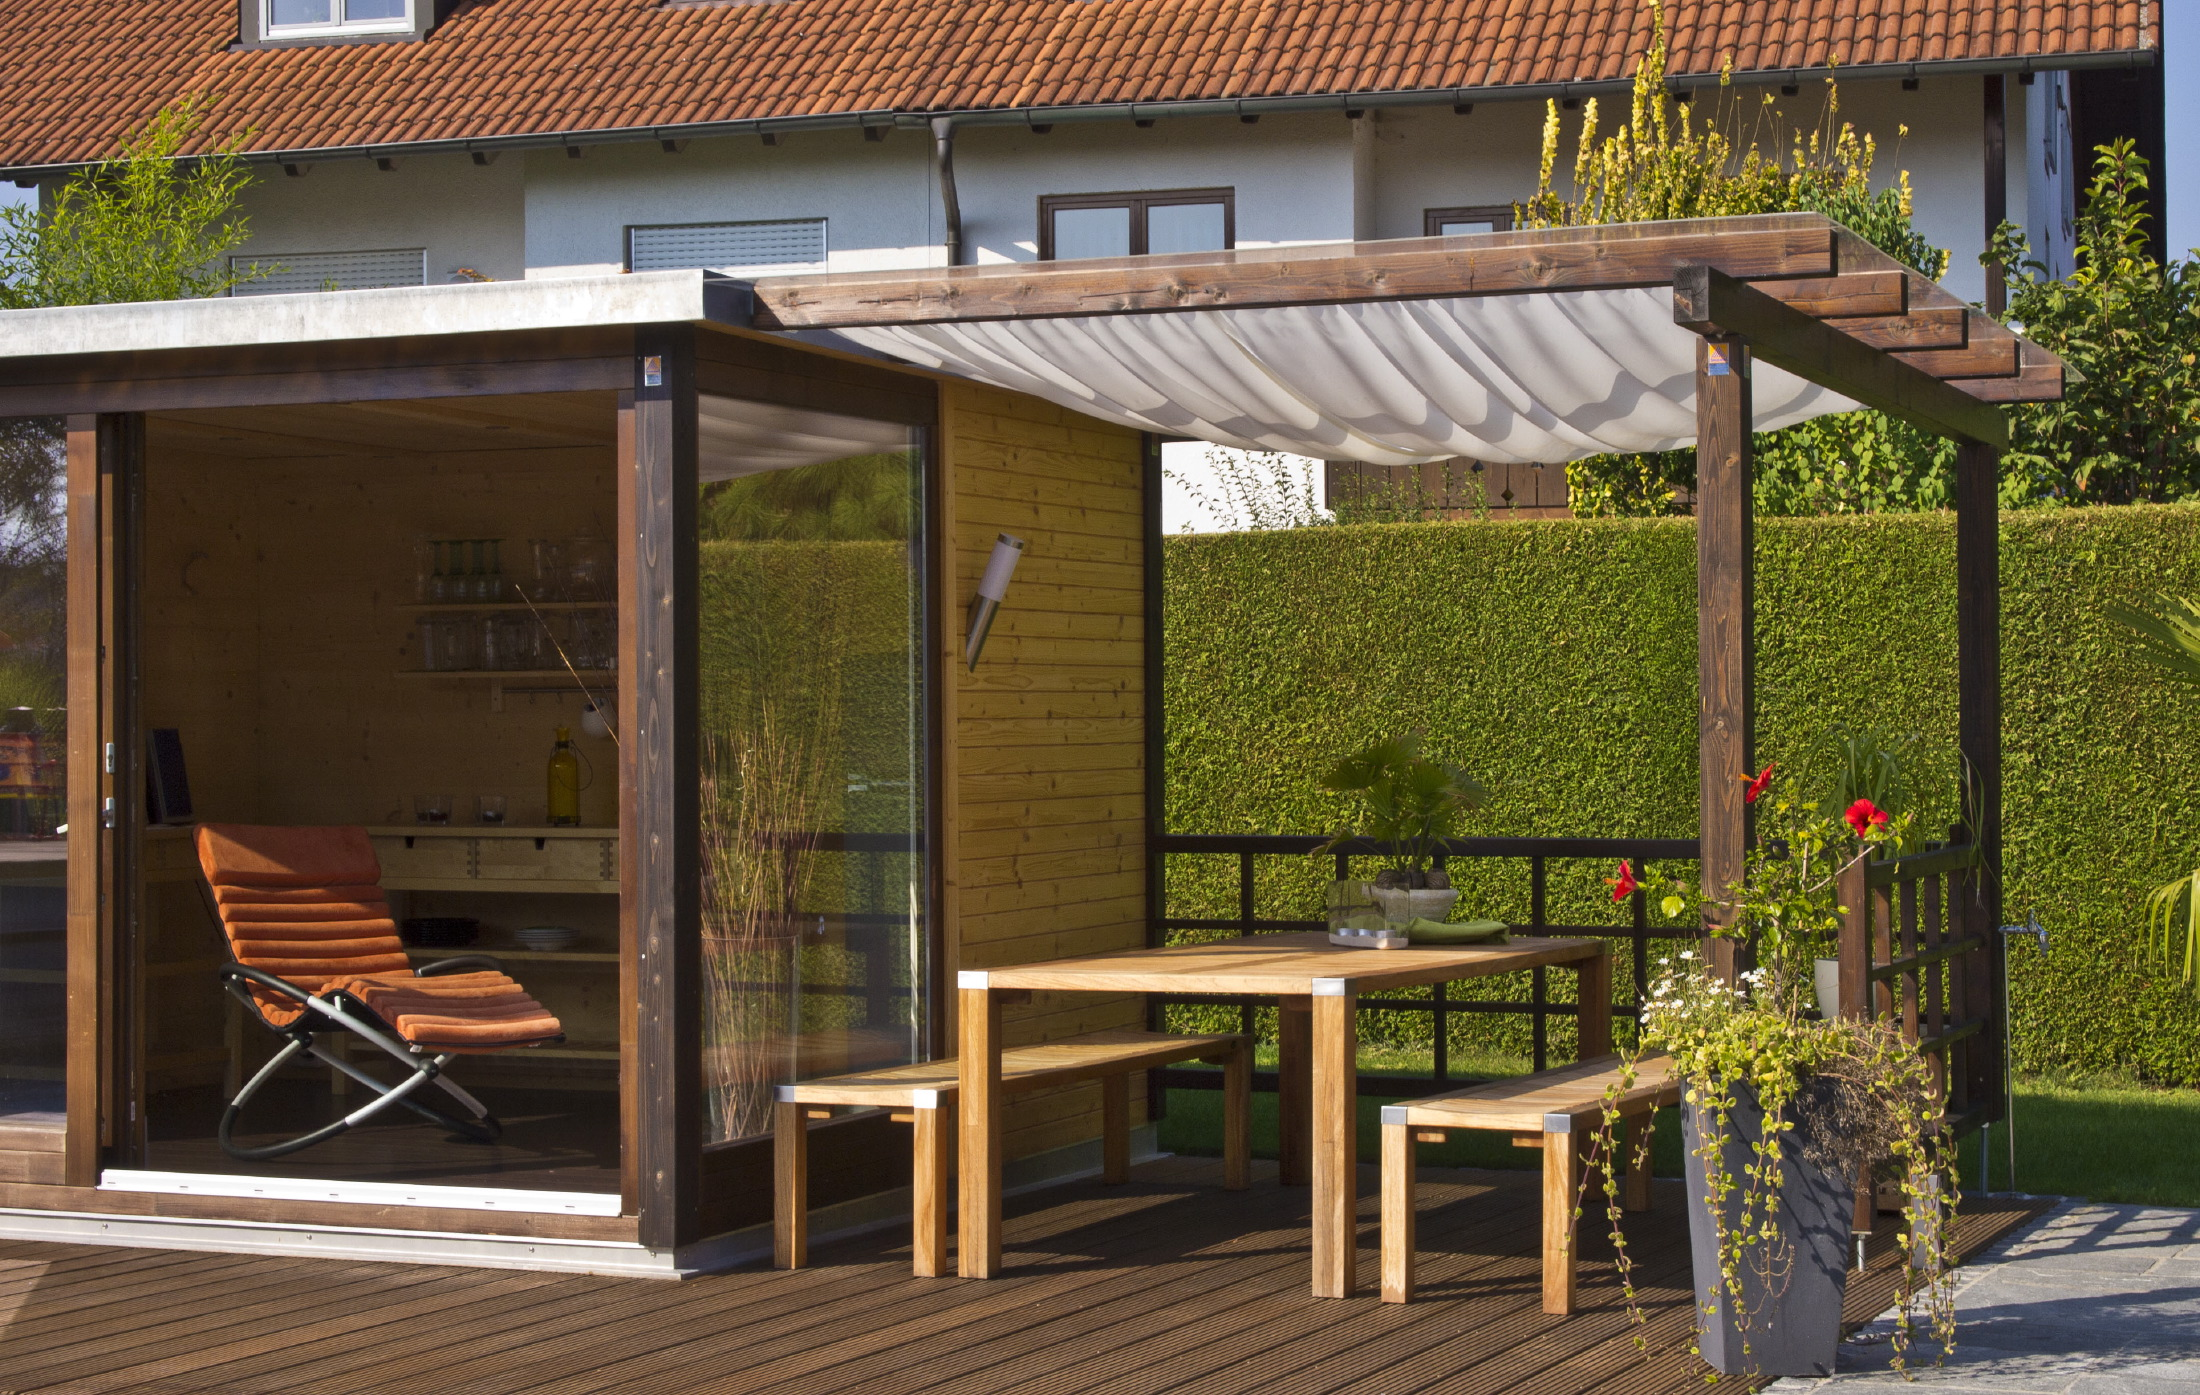 hummel gartenhaus cube preis my blog. Black Bedroom Furniture Sets. Home Design Ideas